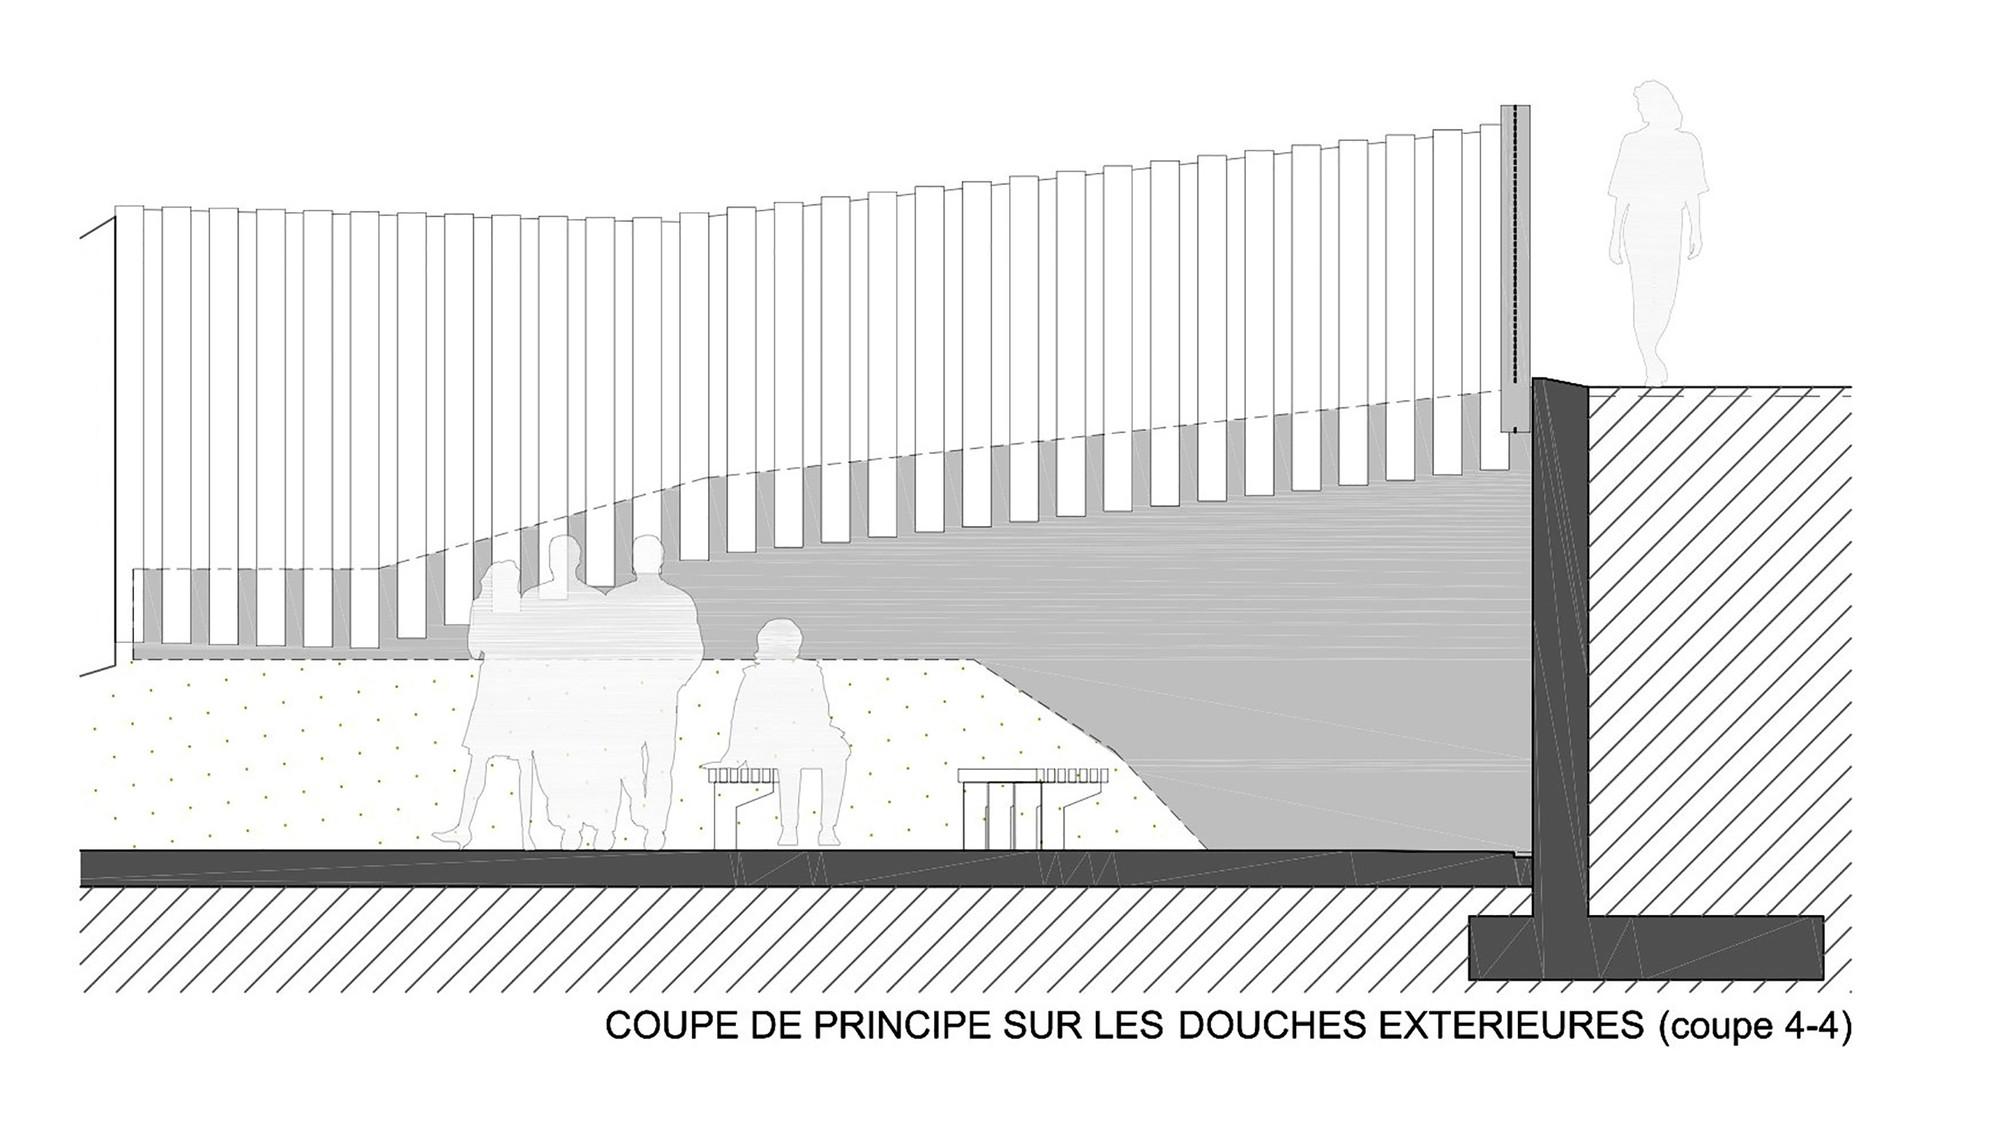 gallery of th tre d 39 eau swimming pool log architectes 23. Black Bedroom Furniture Sets. Home Design Ideas